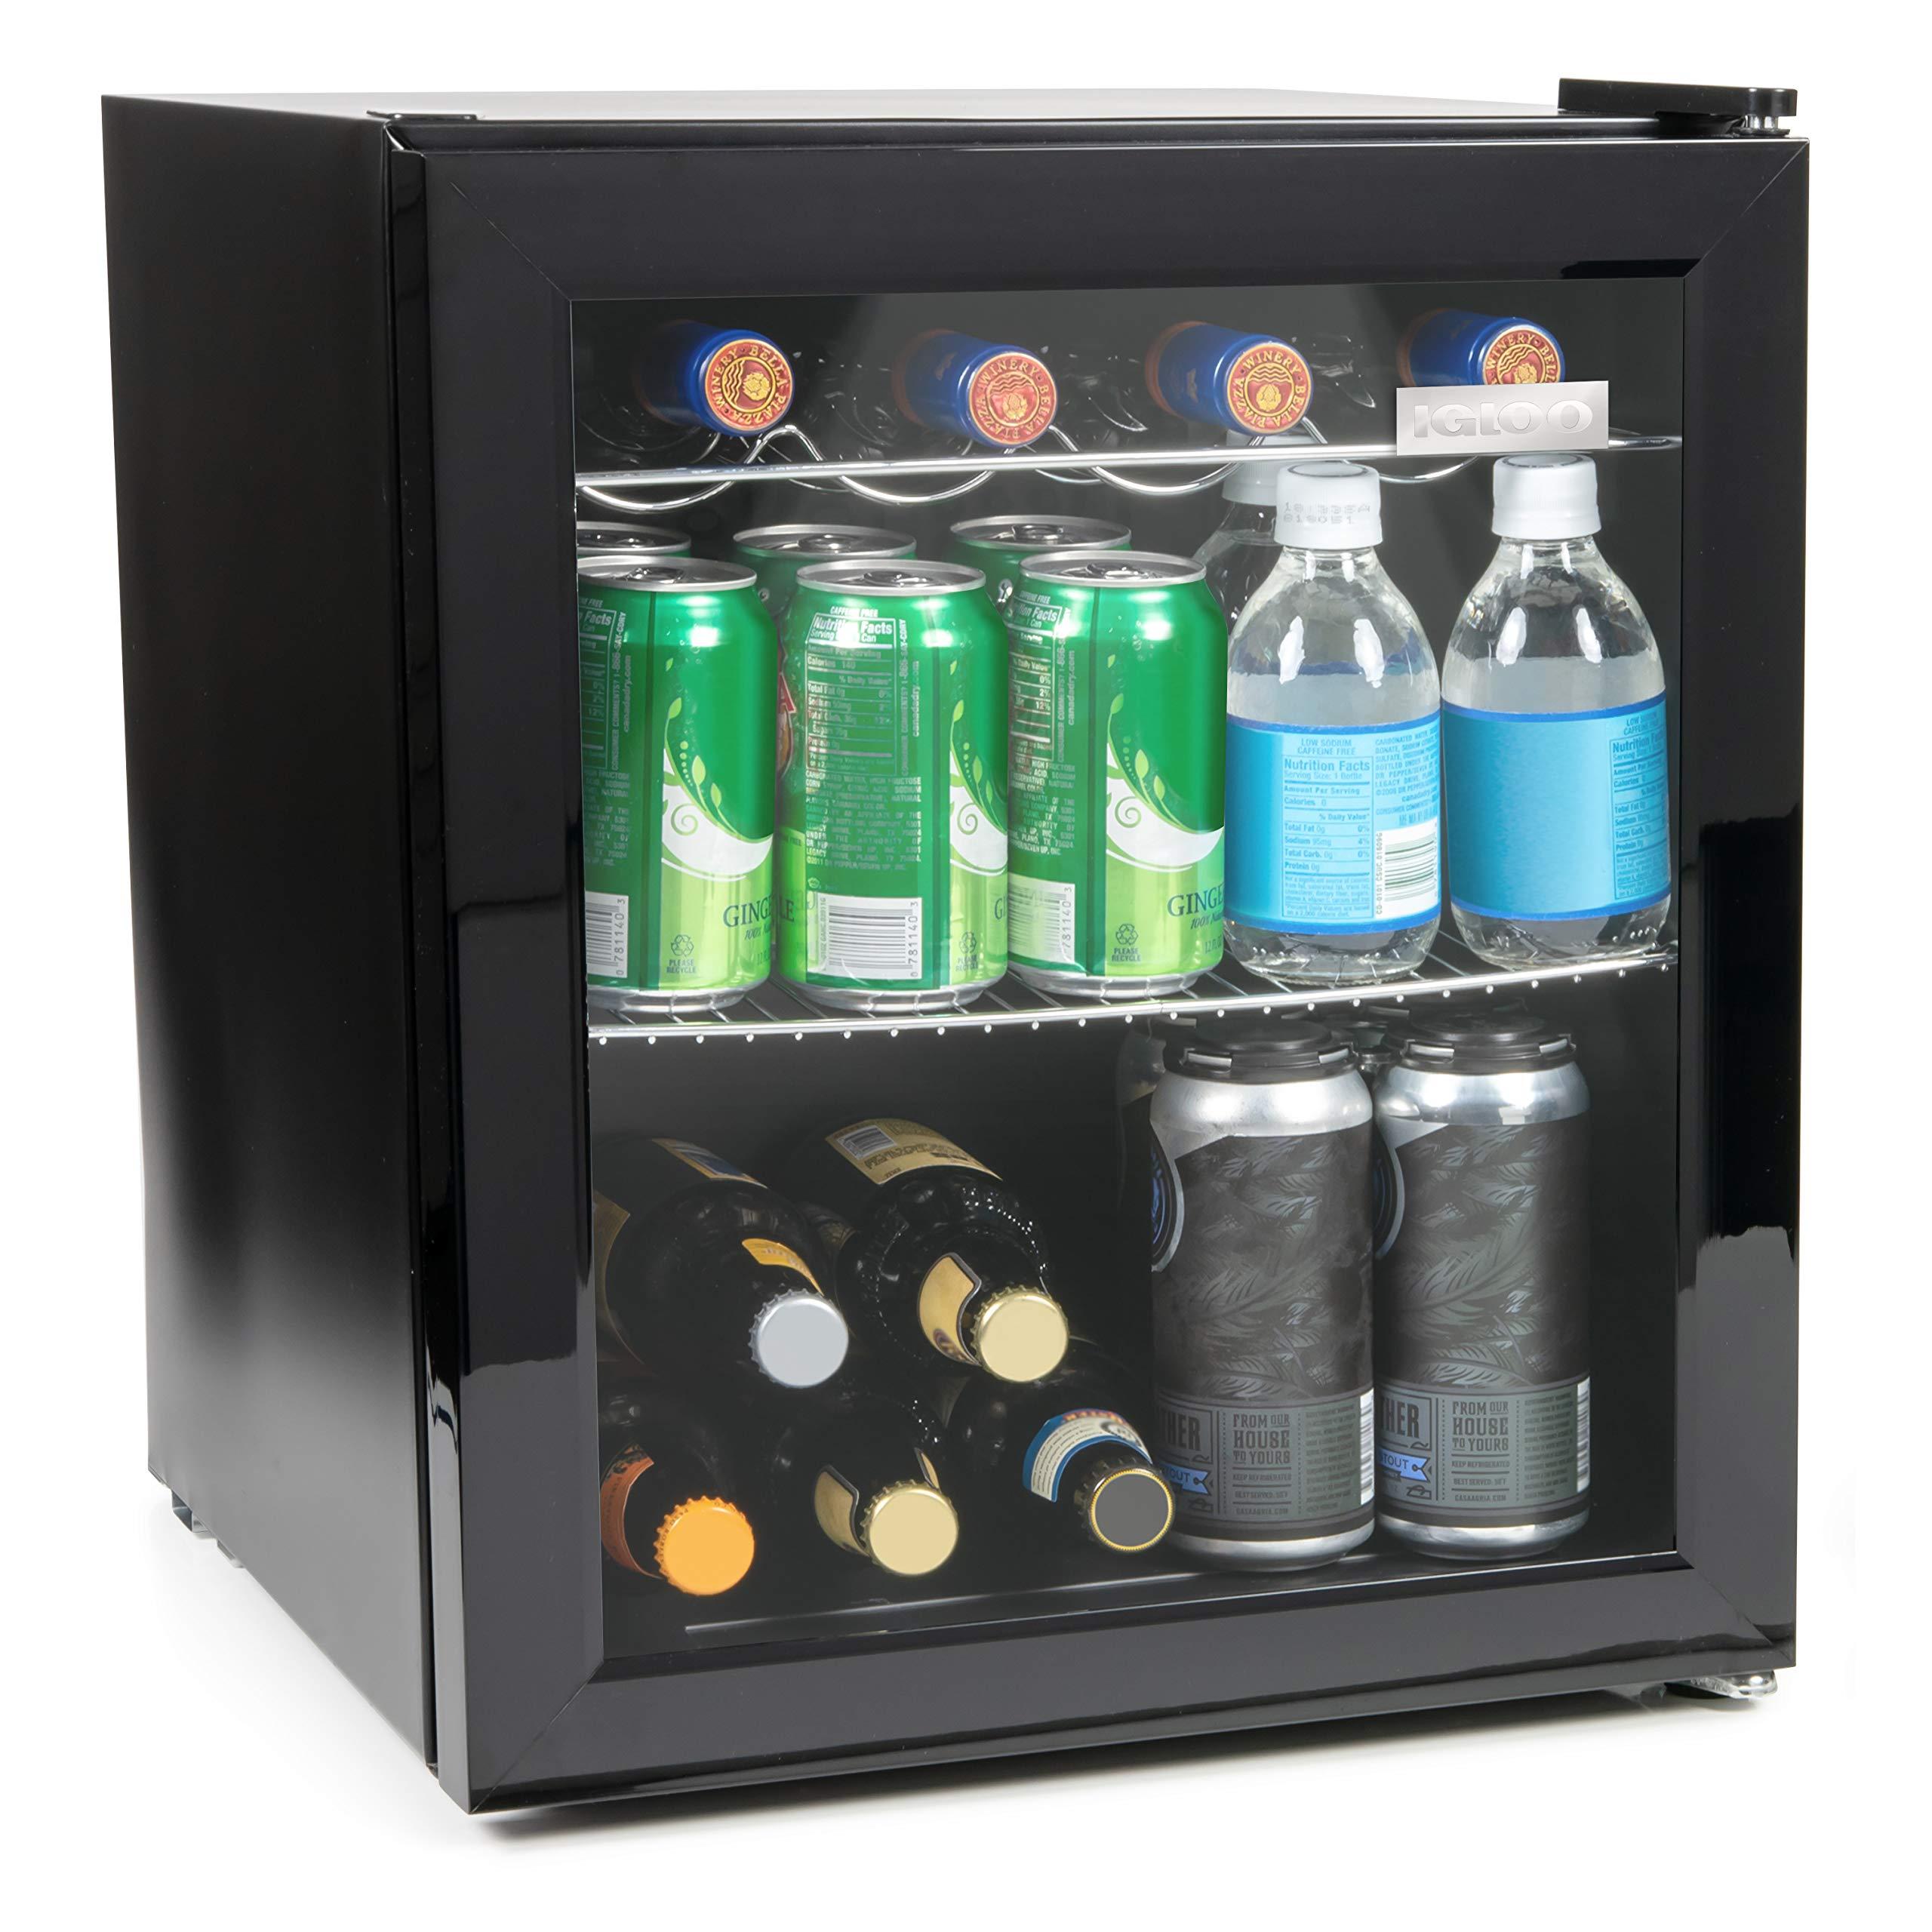 Igloo IBC16BK 15 Wine Beverage Refrigerator